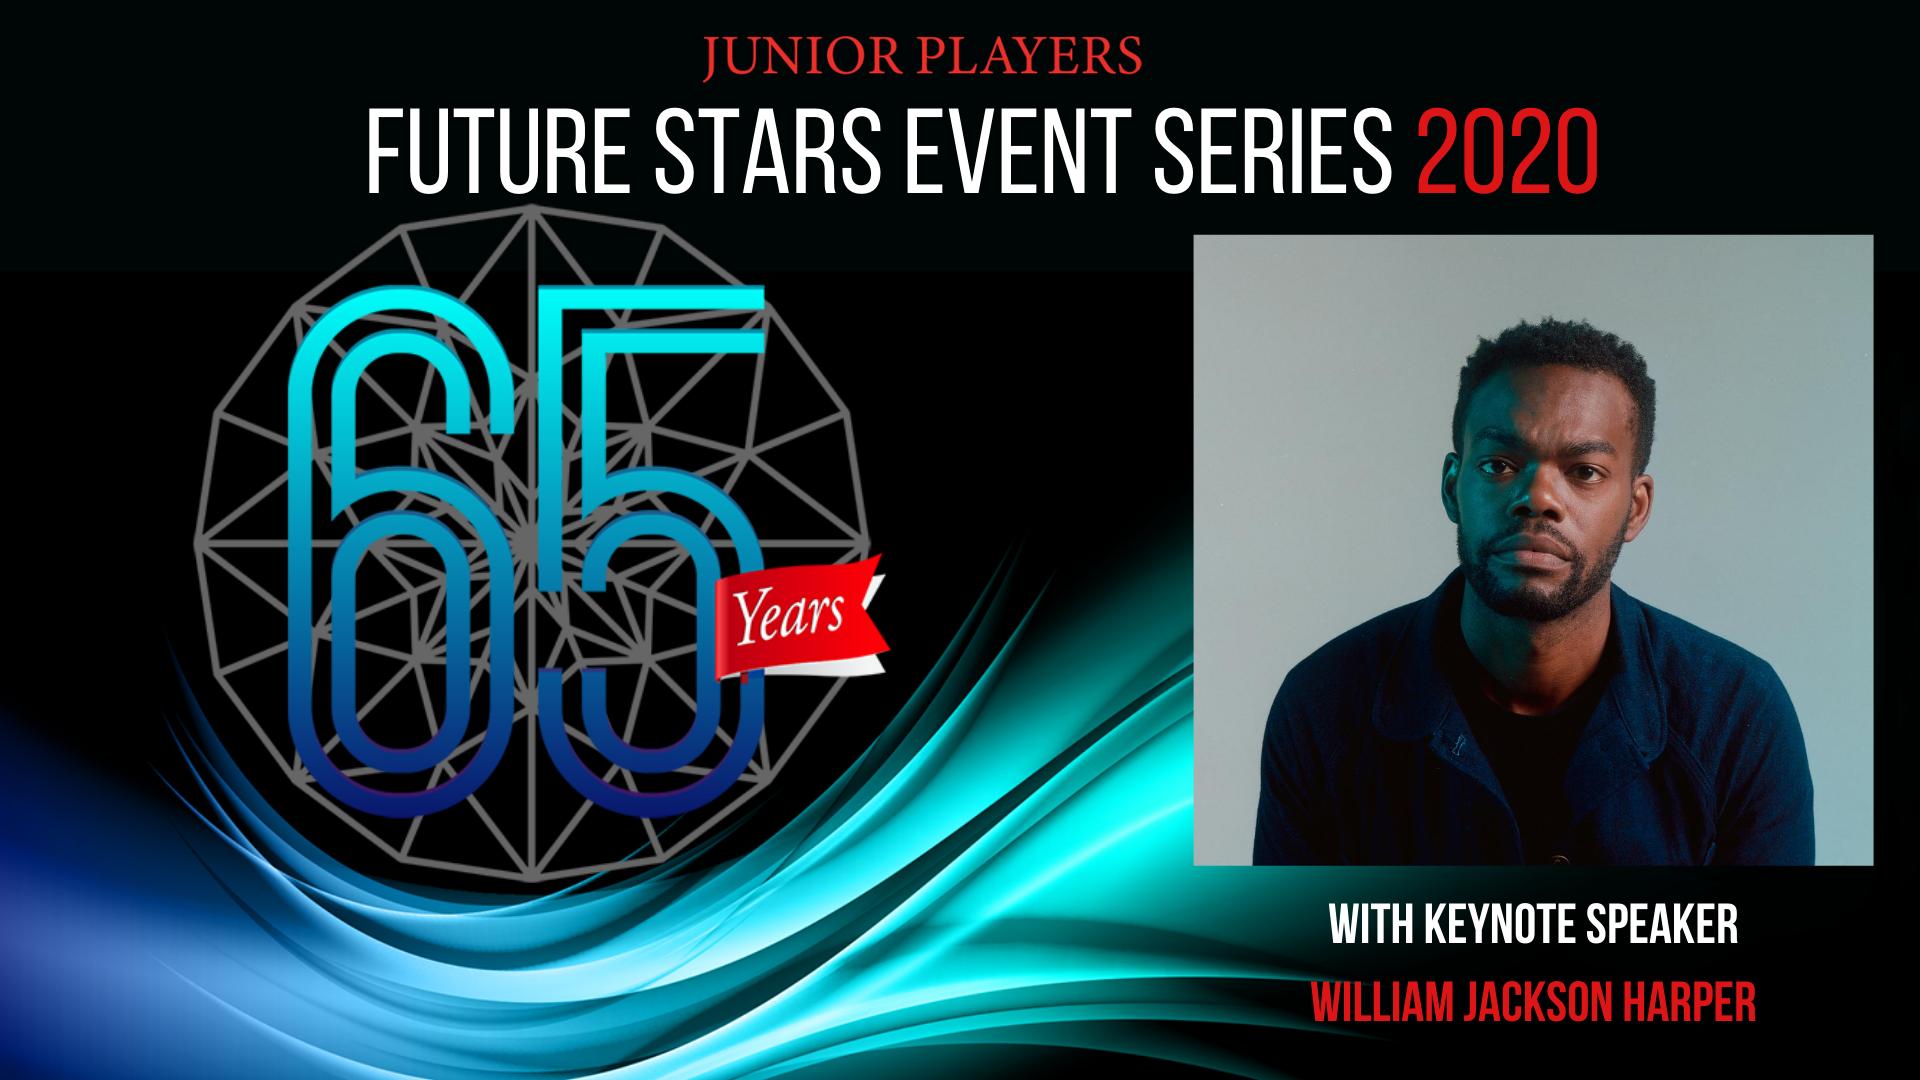 Future Stars Event Series with Keynote Speaker William Jackson Harper